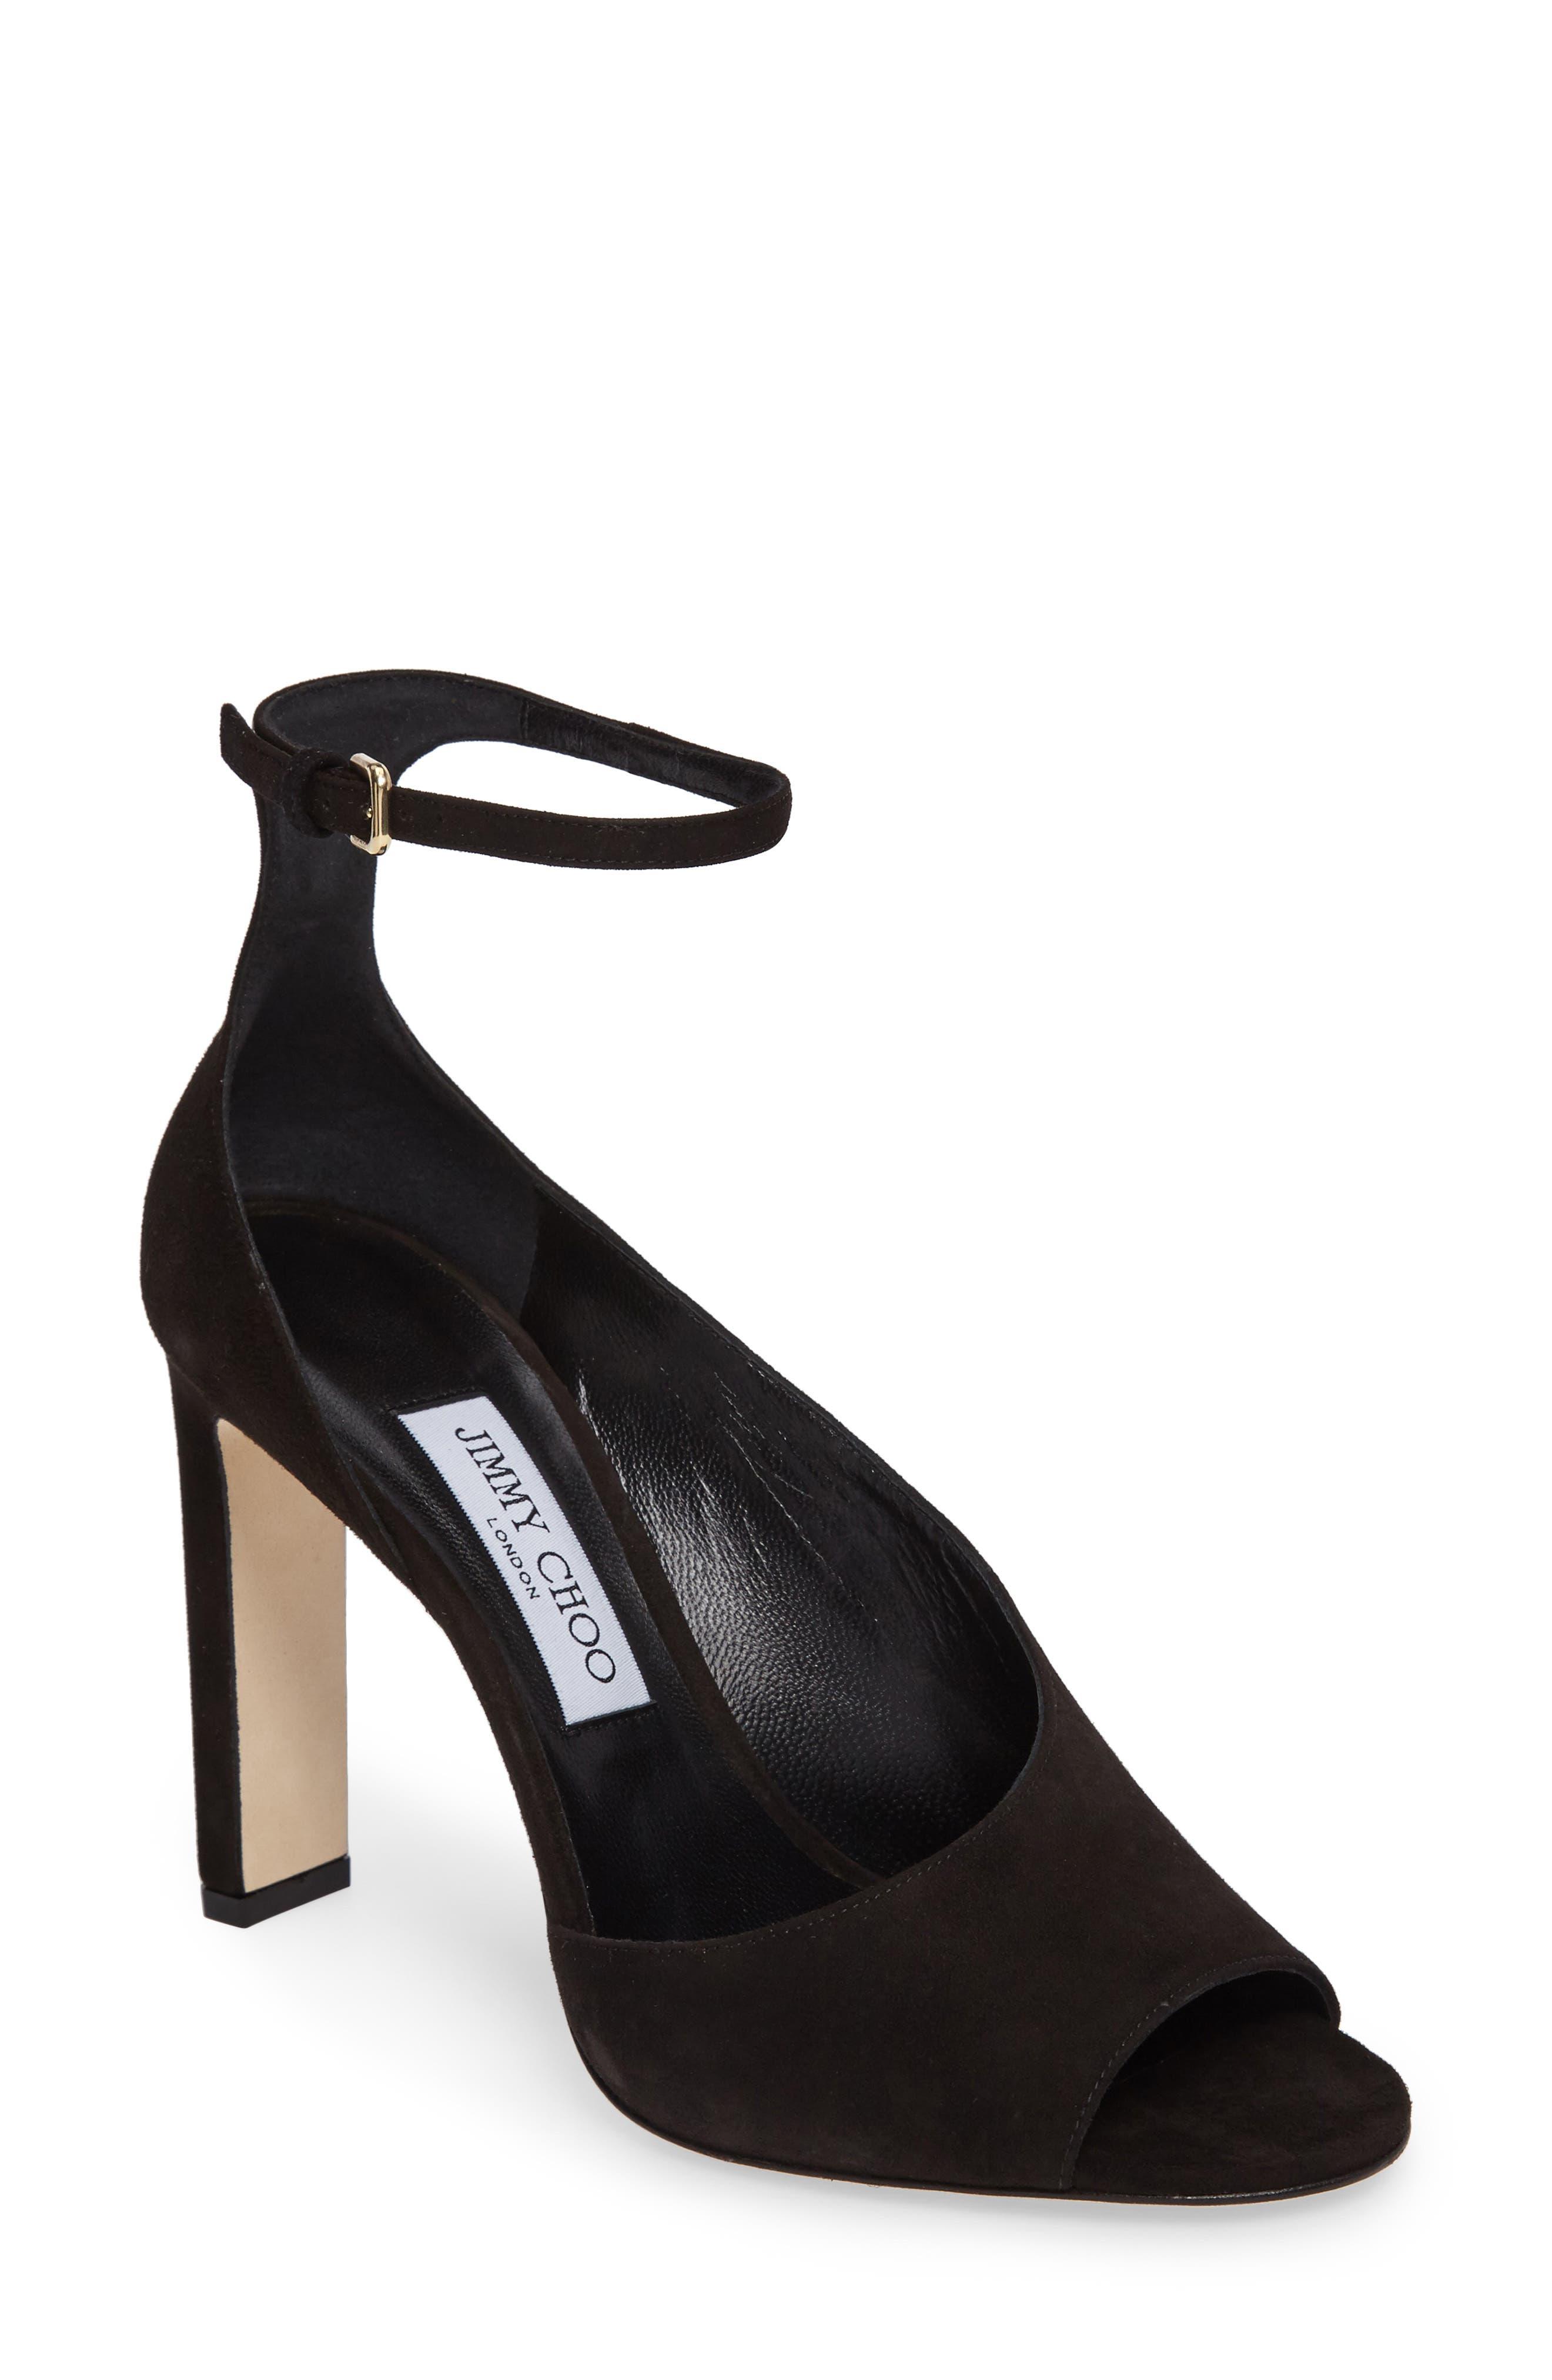 Theresa Ankle Strap Sandal,                             Main thumbnail 1, color,                             001